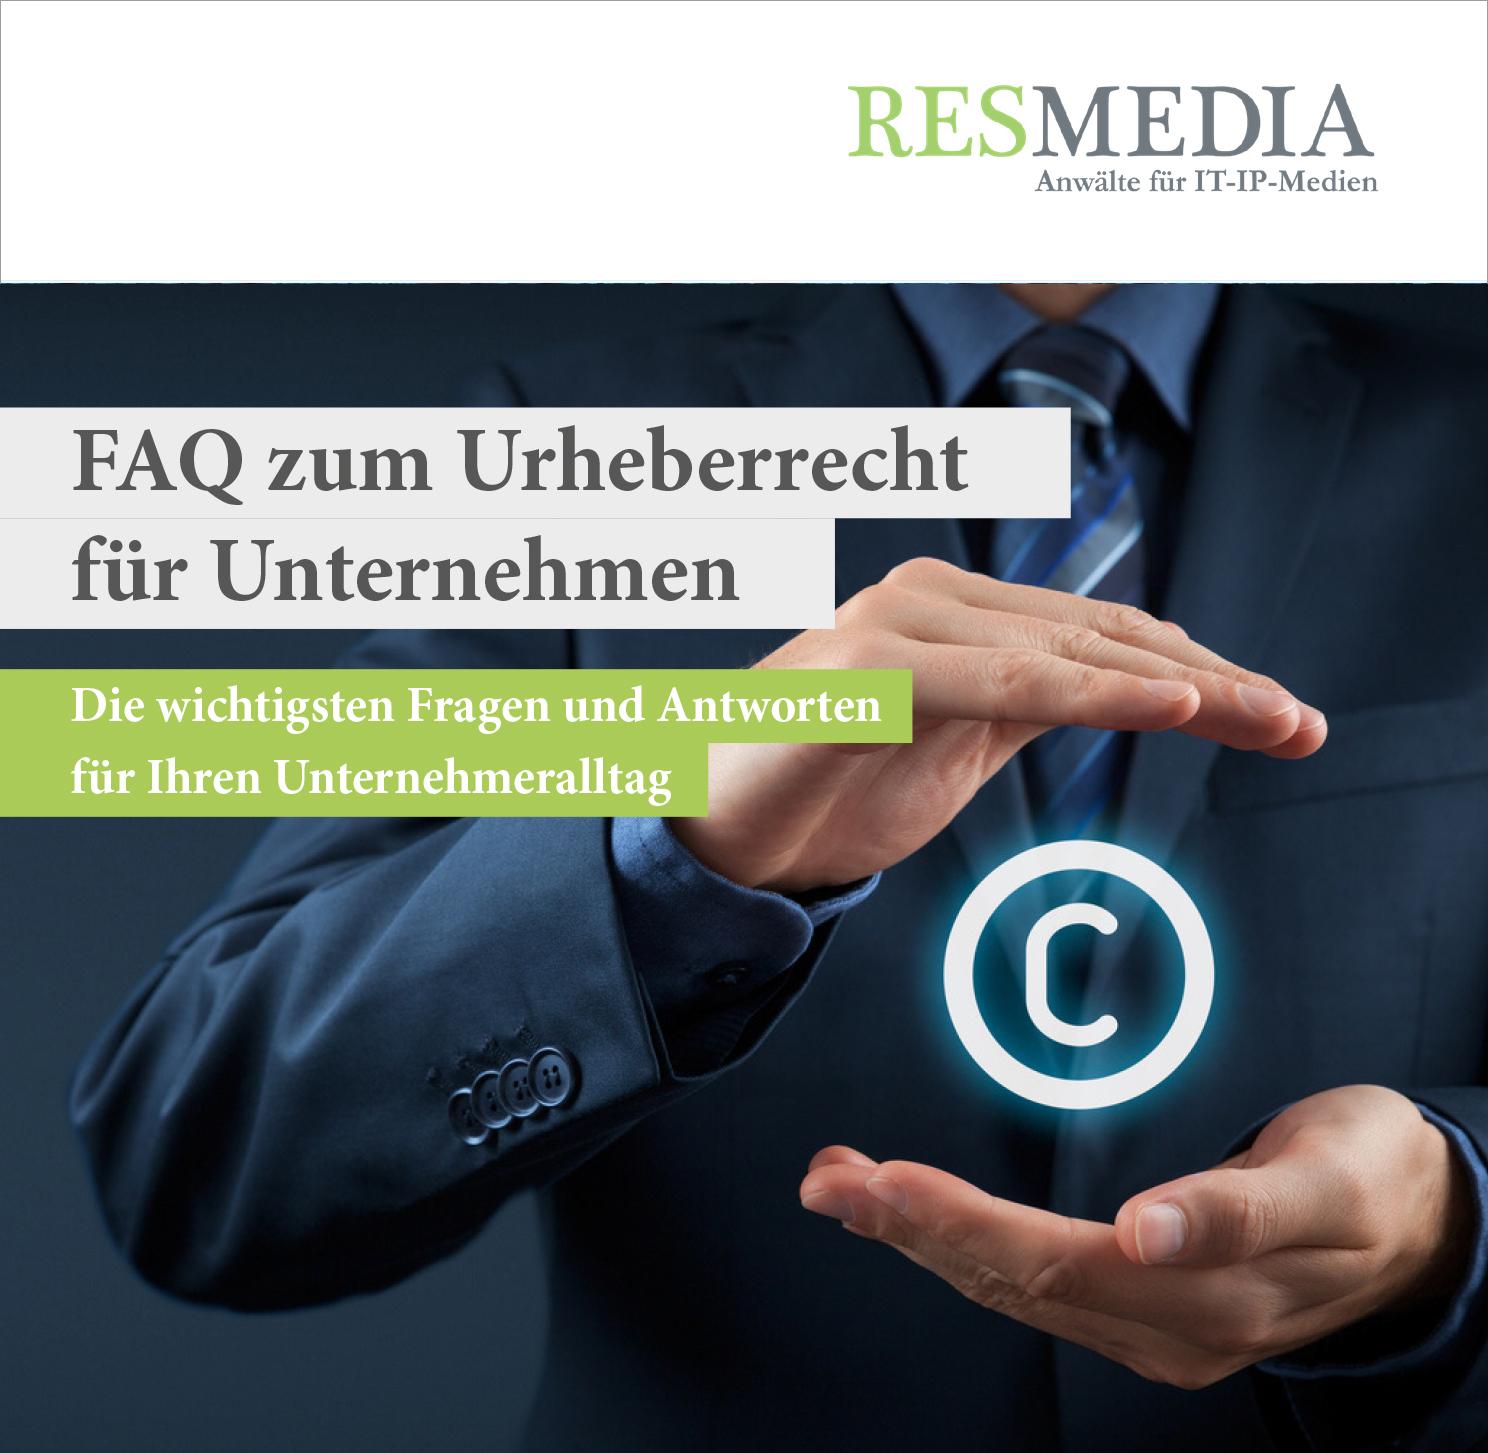 Booklet E-Book Urheberrecht